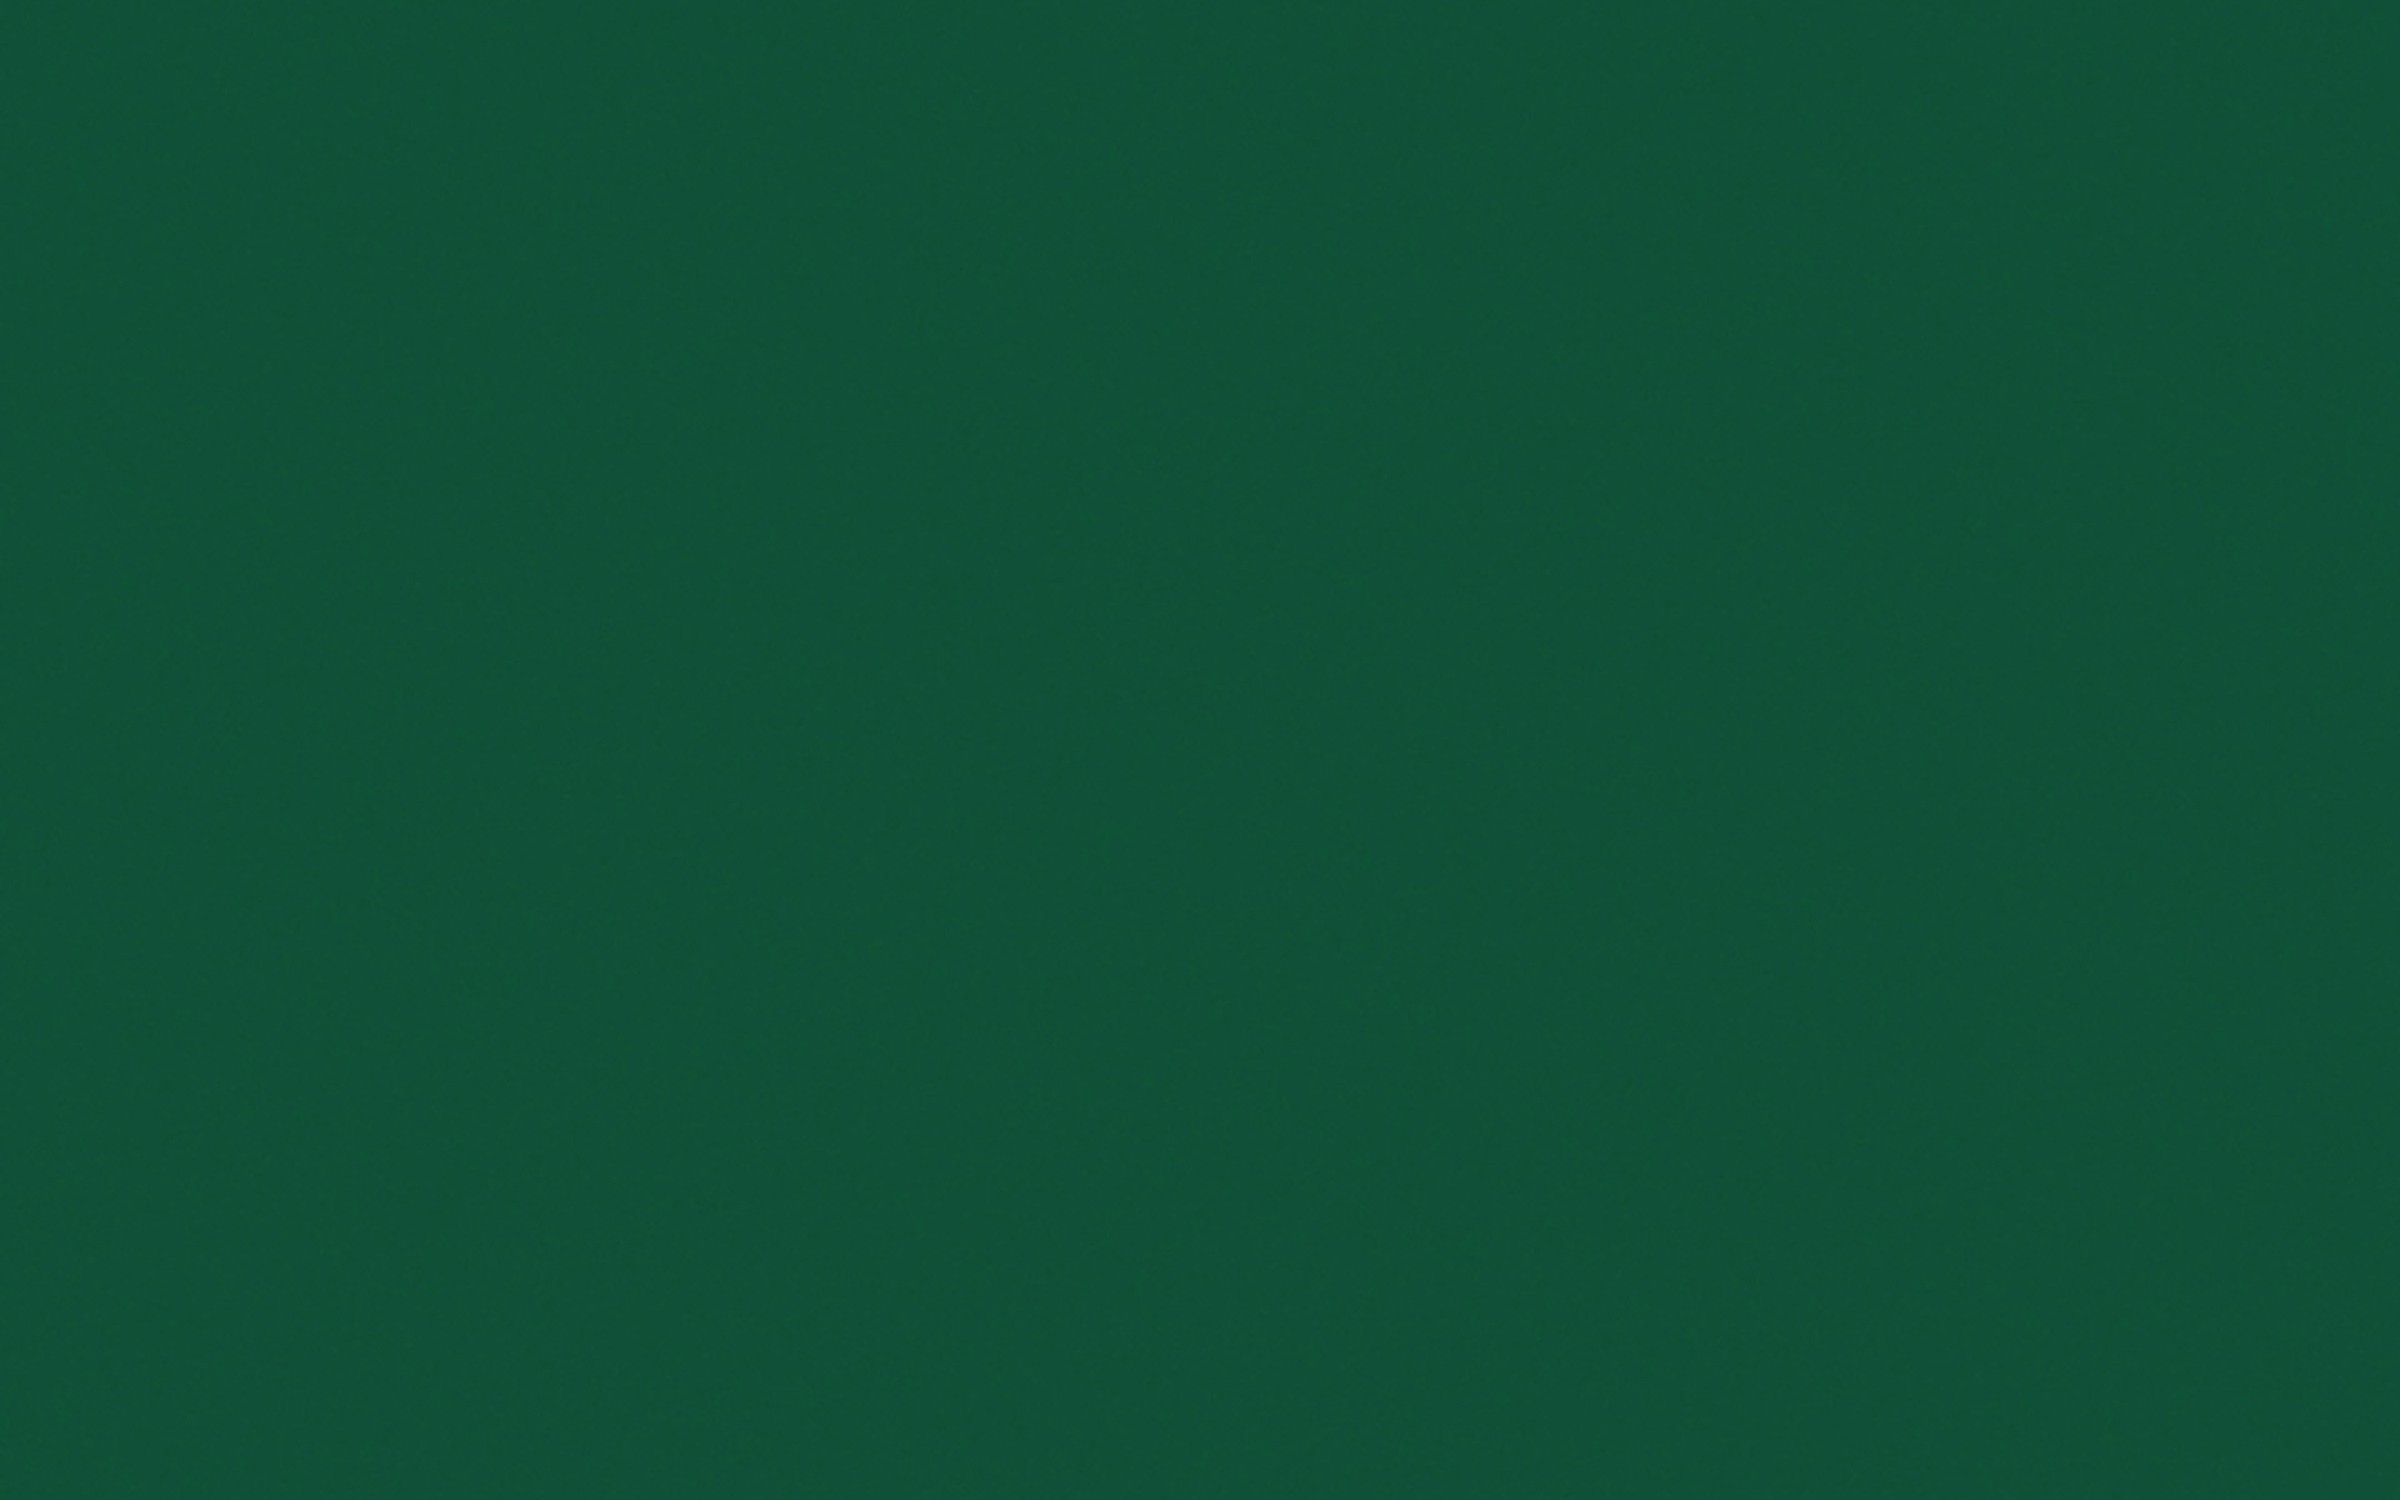 D79 Hunter Green - Wilsonart